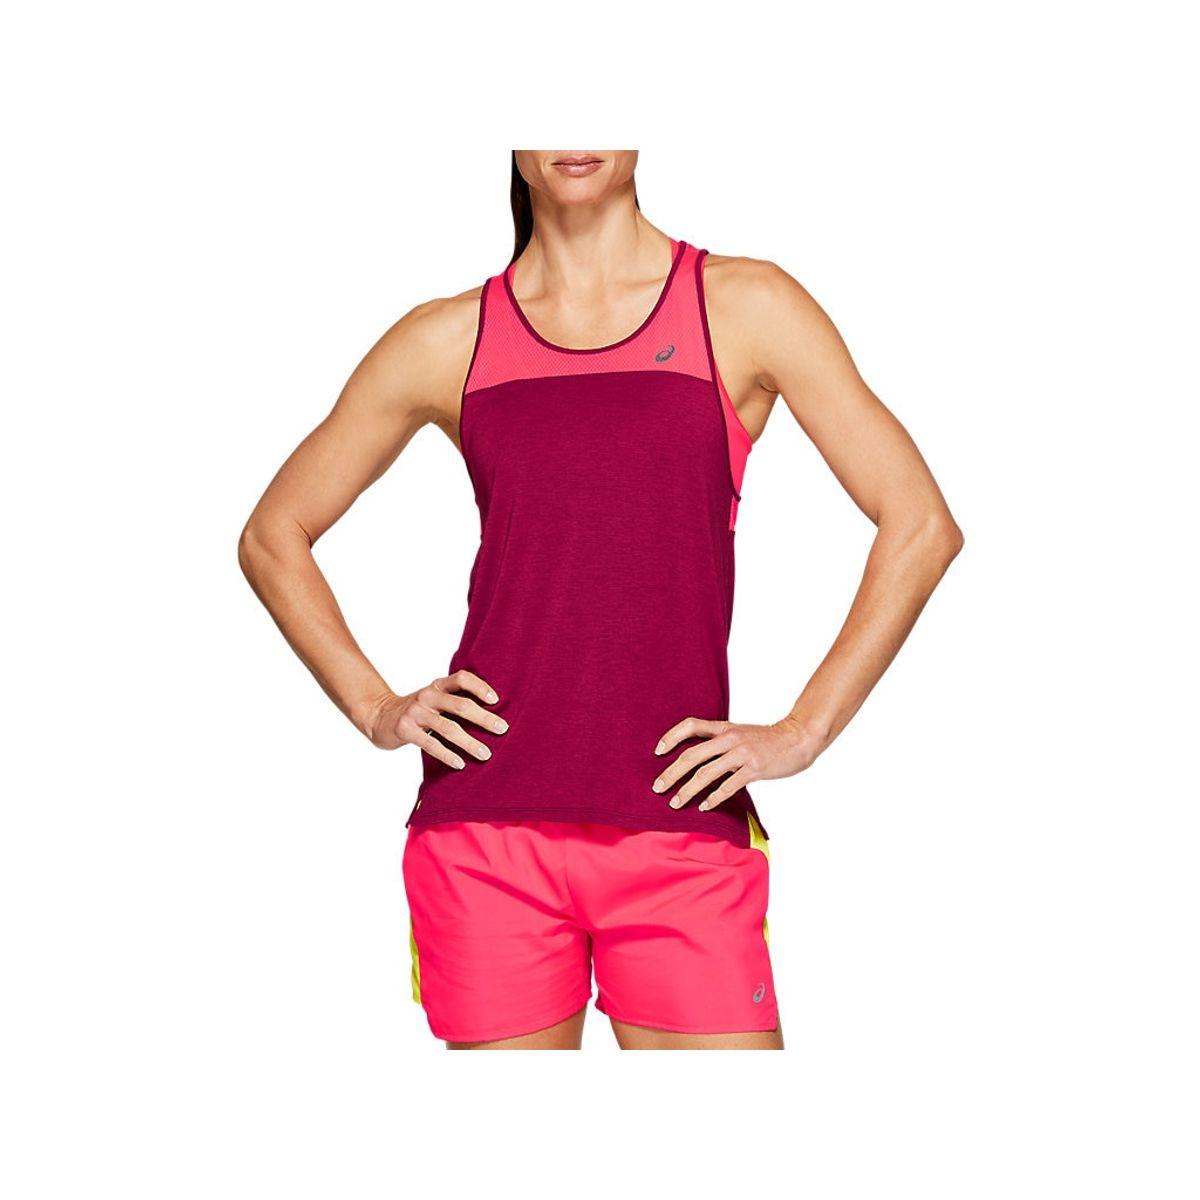 Camisa-Regata-Asics-Loose-Strappy----Feminino---Rosa